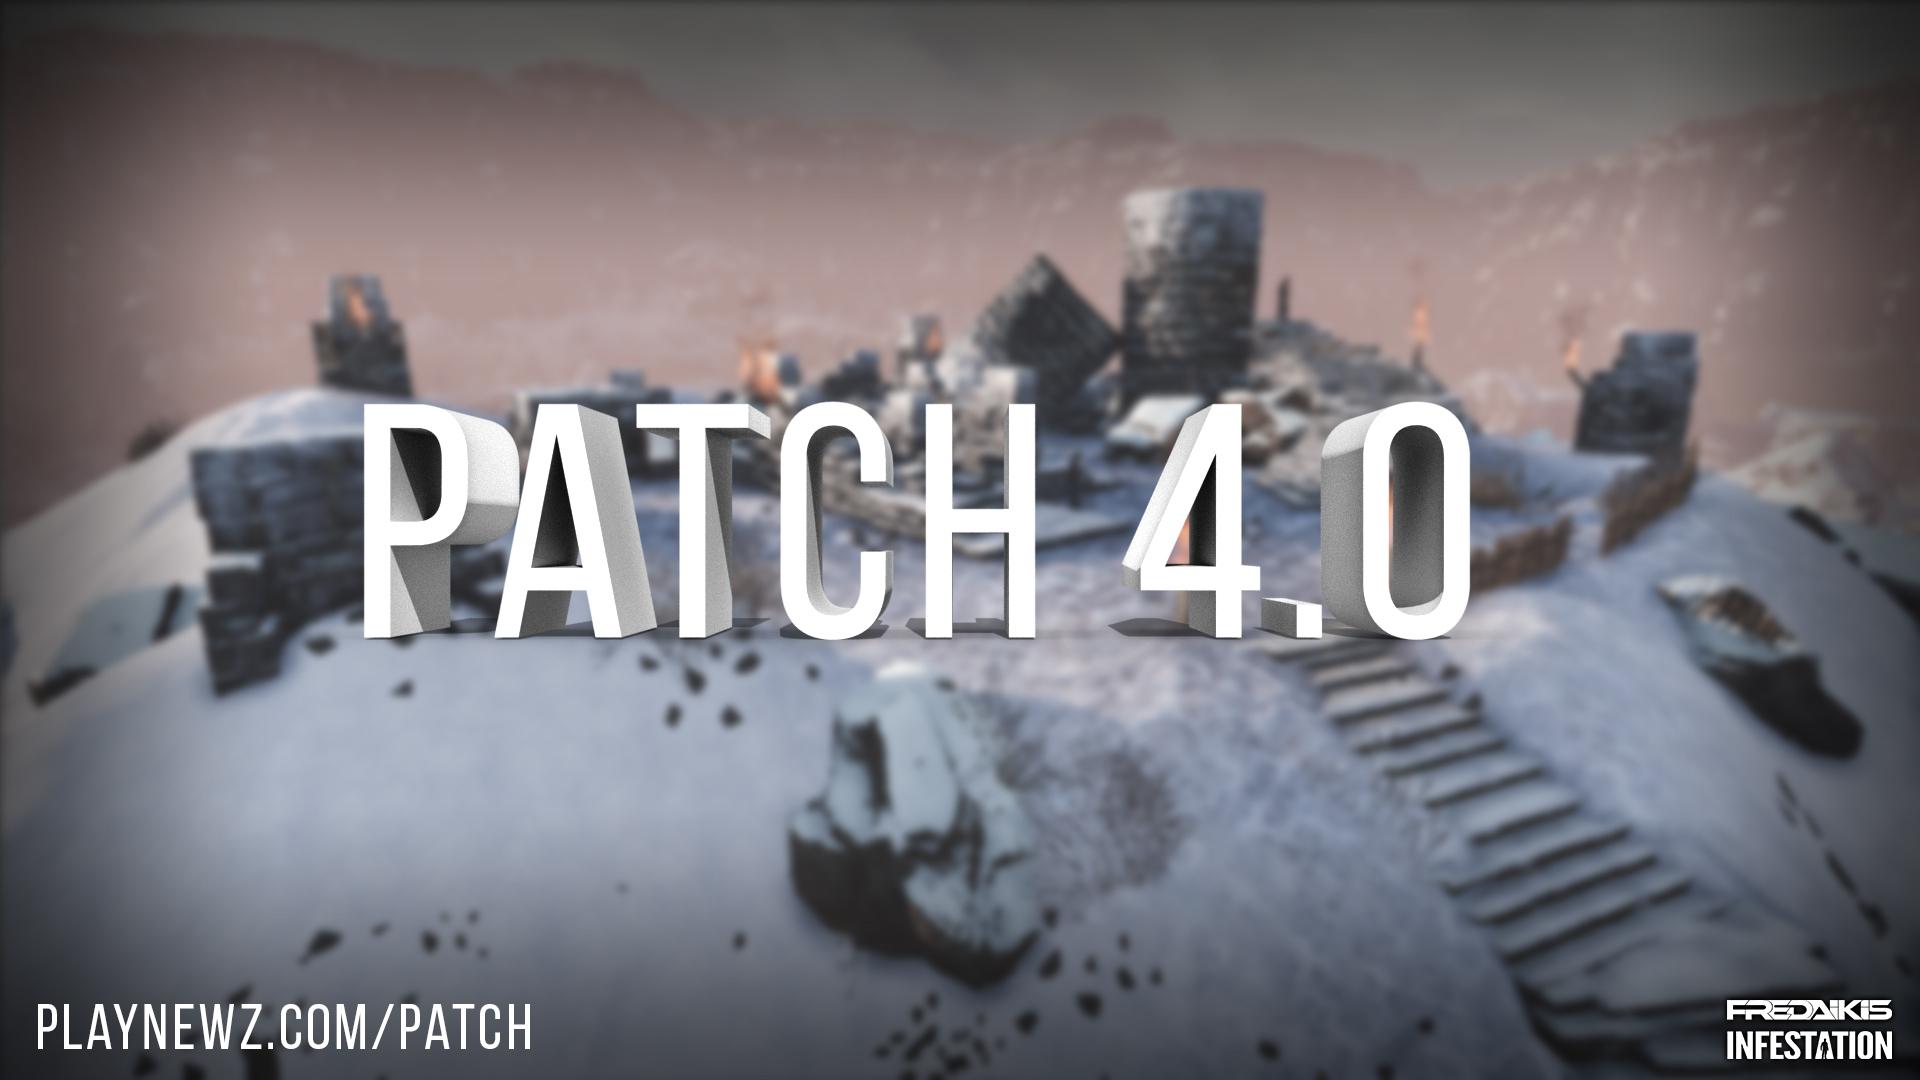 Patch 4.0